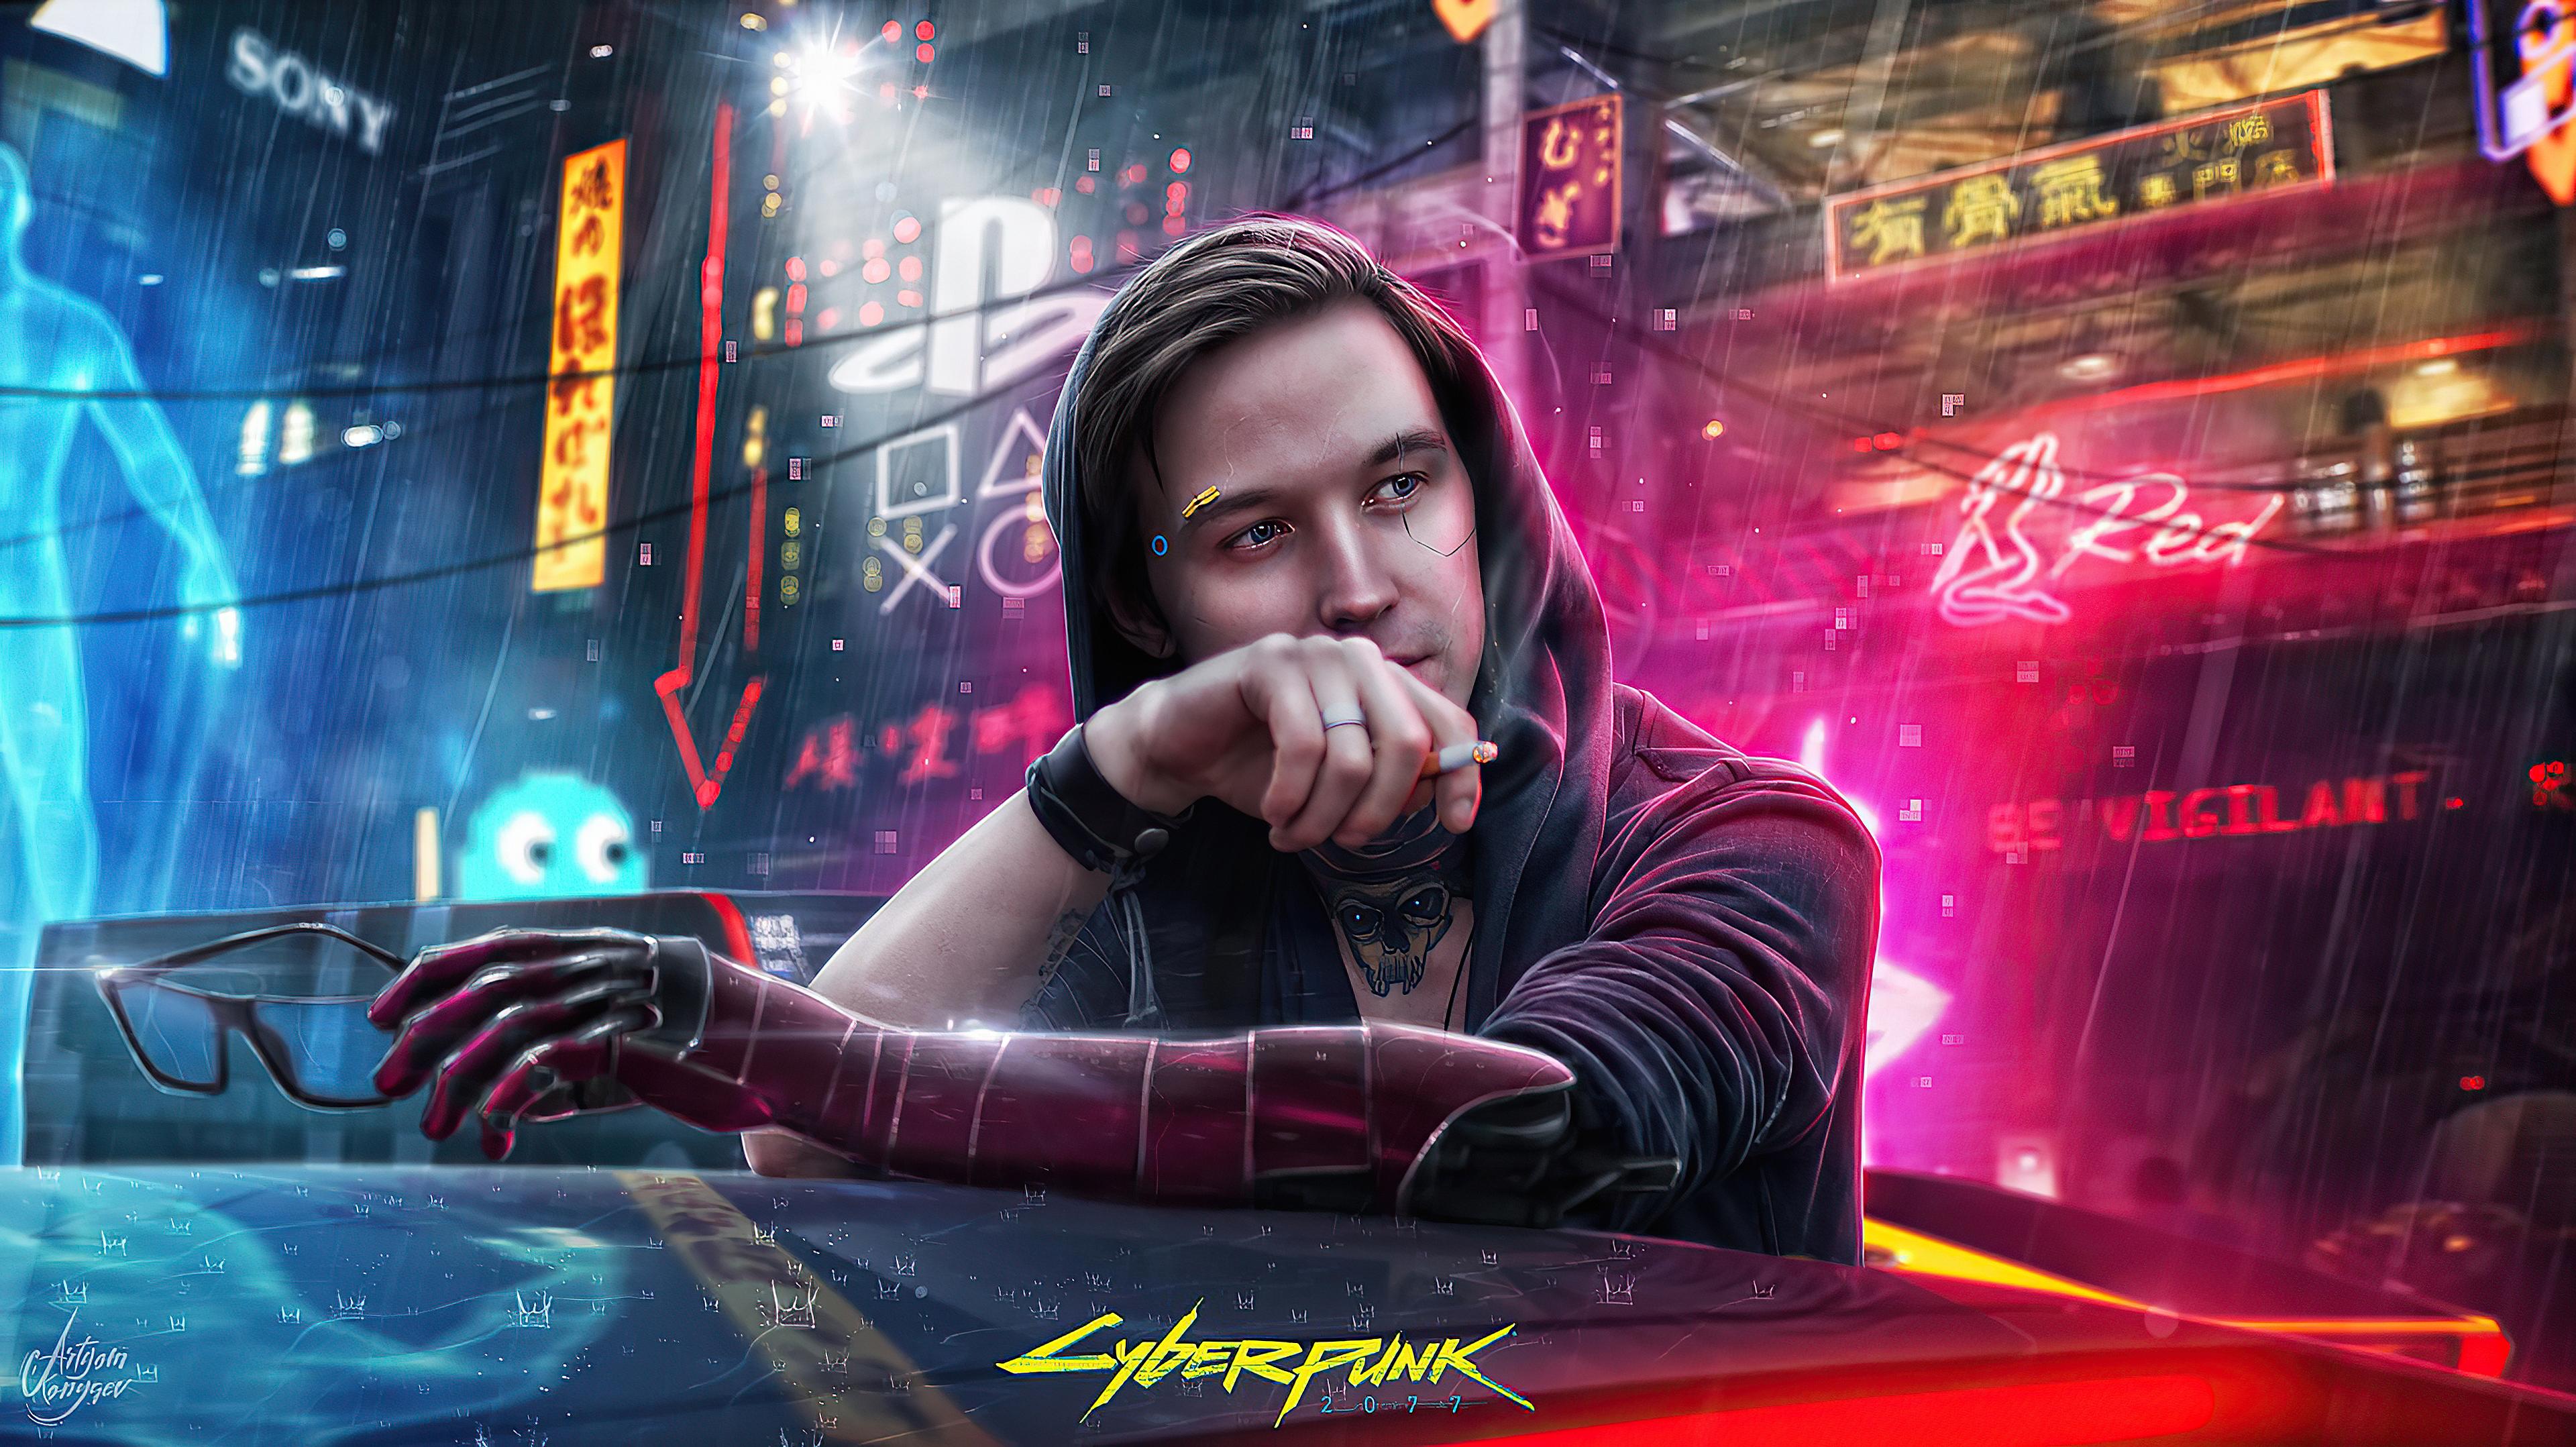 Cyberpunk 2077 cyberpunk 2077 wallpapers, Cyberpunk 2077 ...